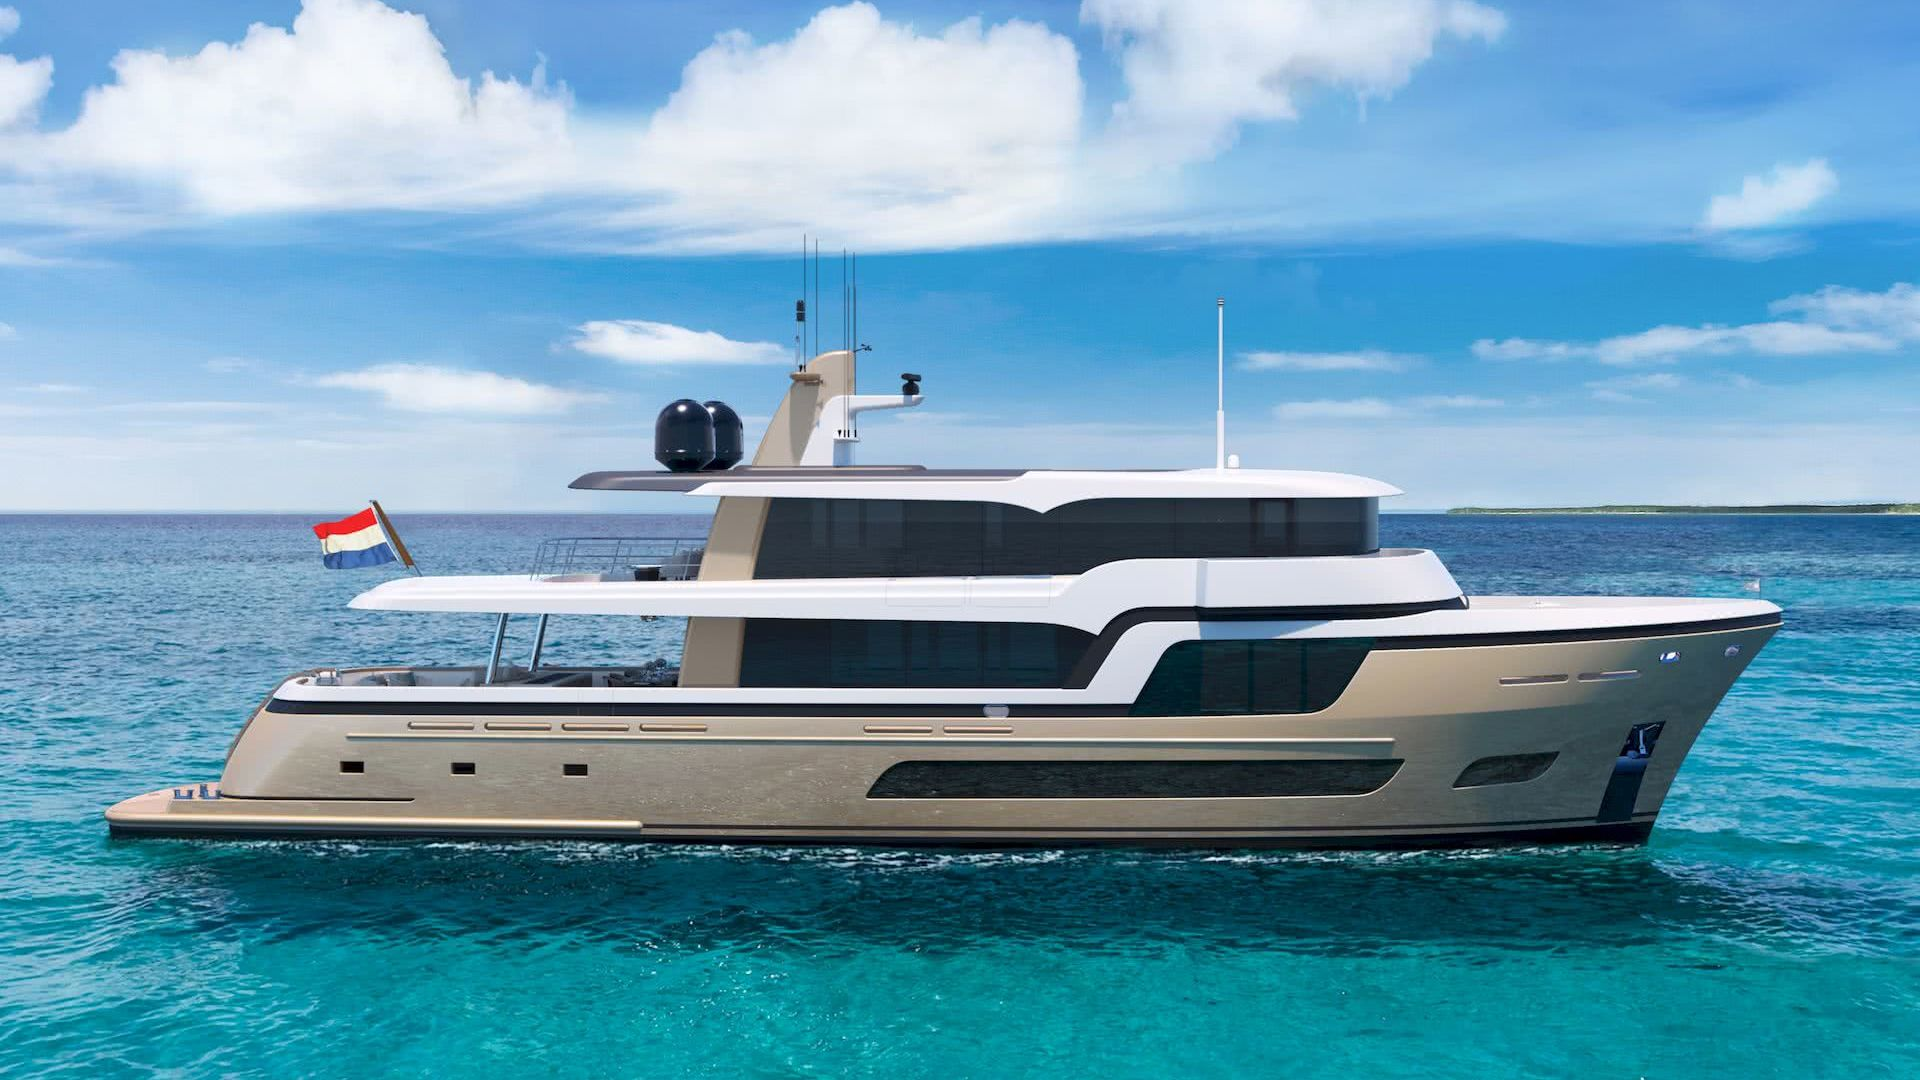 Lady Lene Yacht 34m Explorer Van der Valk Shipyard